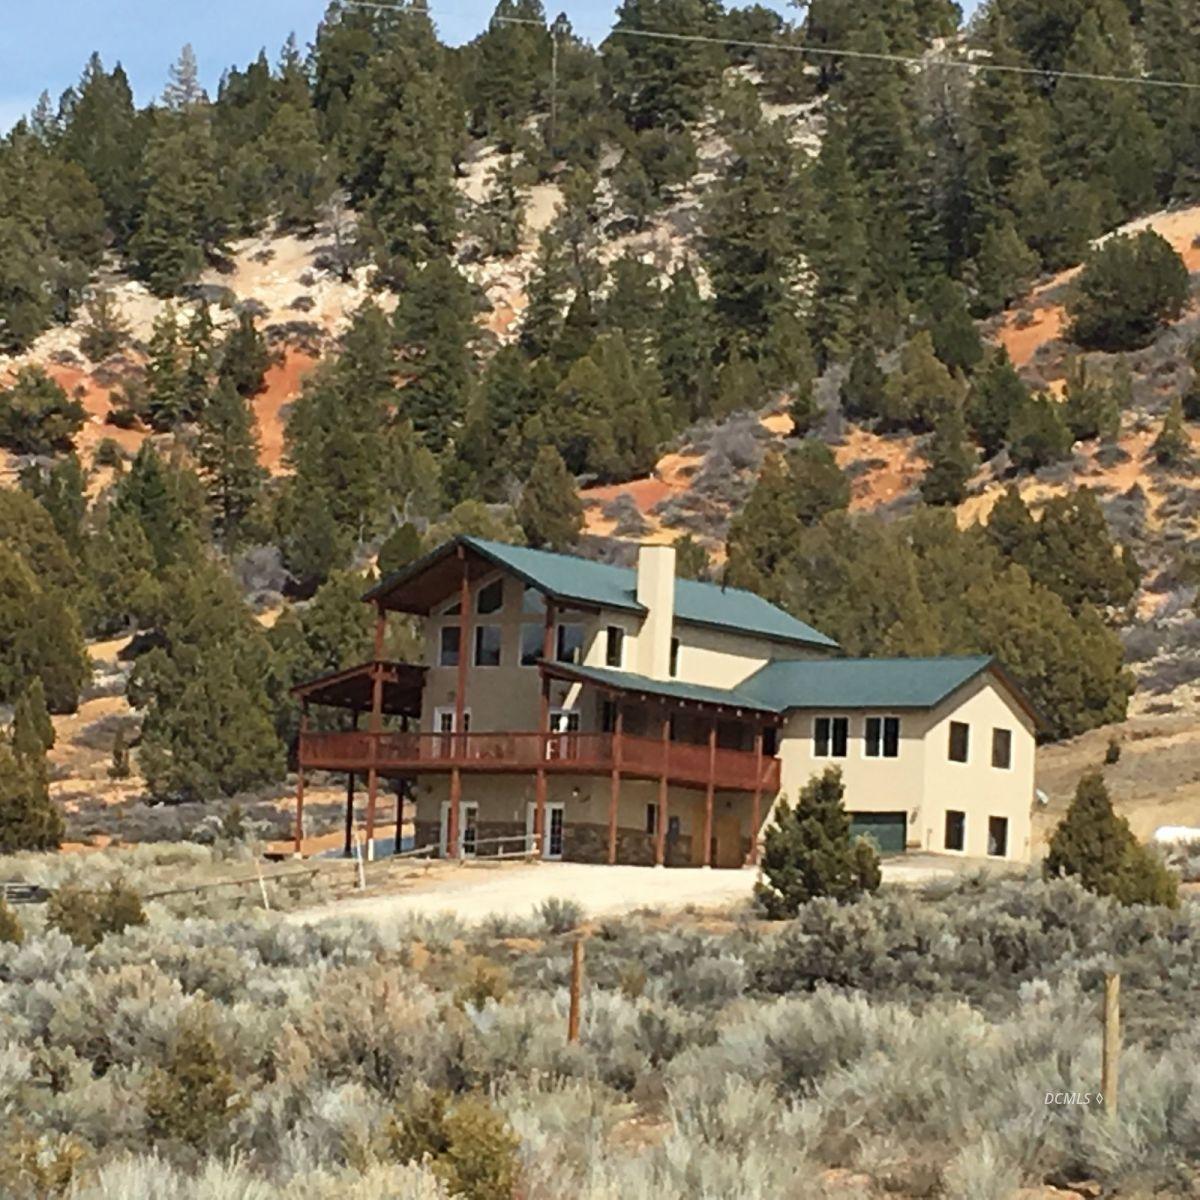 Duck Creek Village Utah >> 4990 N Pecos Dr Duck Creek Village Ut 84762 6 Bed 4 Bath